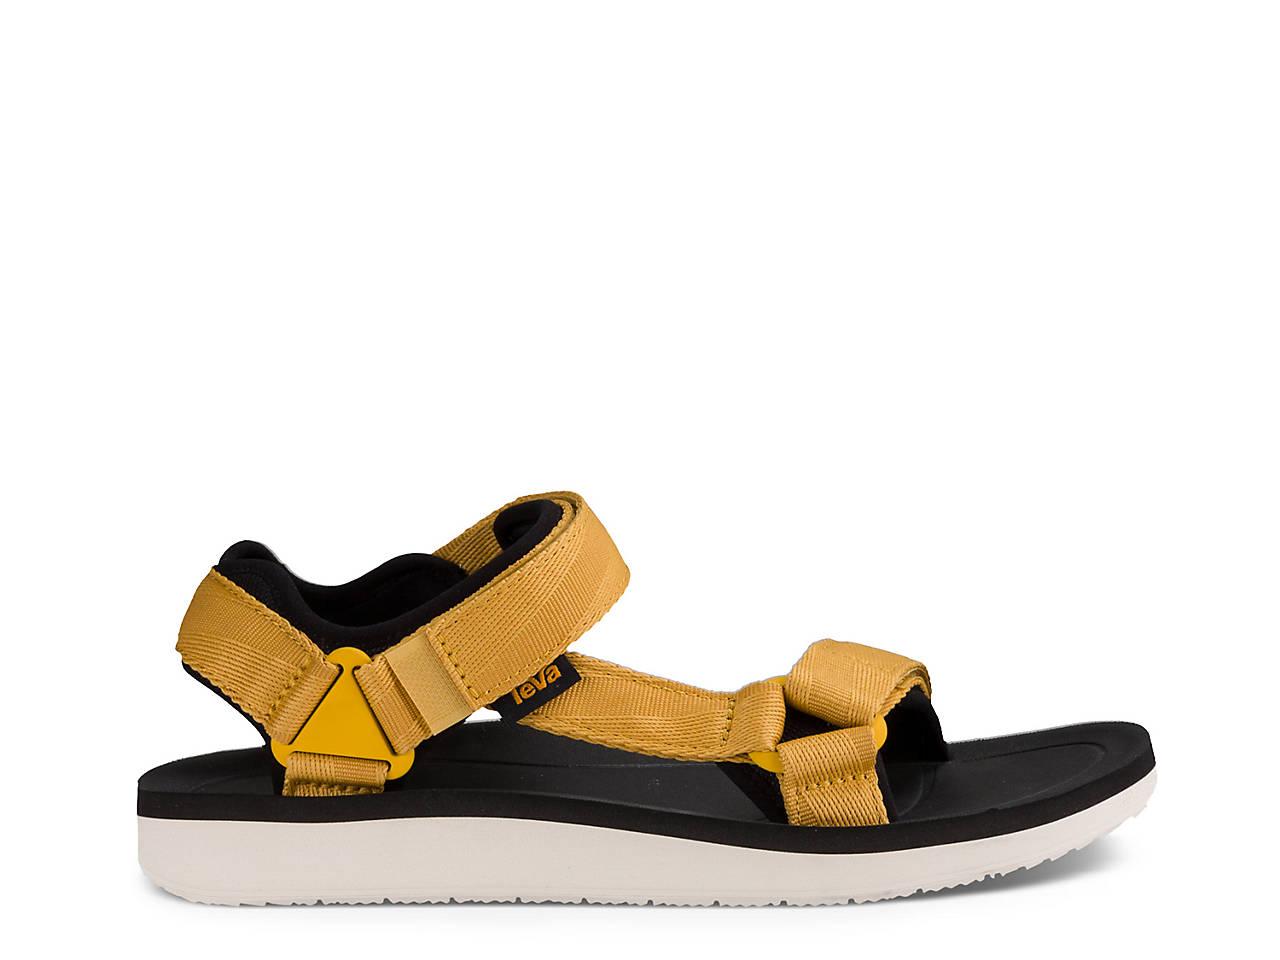 ab26d00e31c6 Teva Original Universal Premier Sandal Men s Shoes